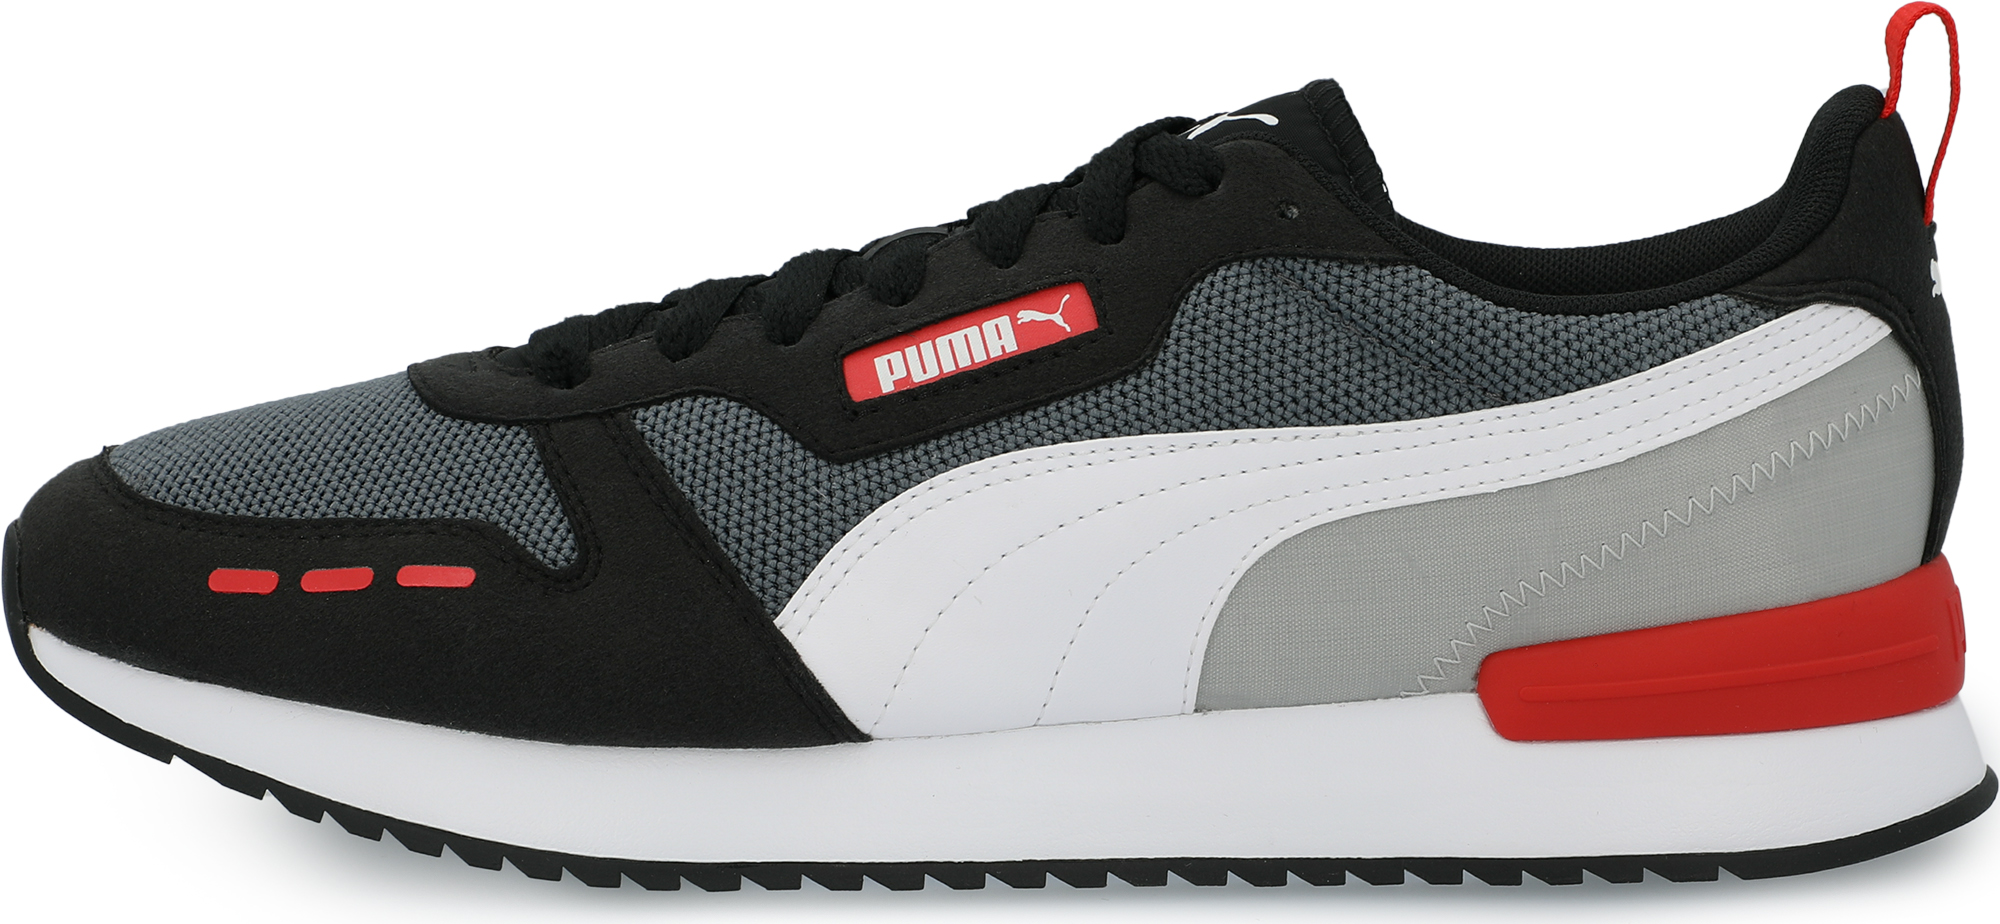 Фото - Puma Кроссовки мужские Puma R78, размер 43 puma кроссовки мужские puma bmw mms roma размер 43 5